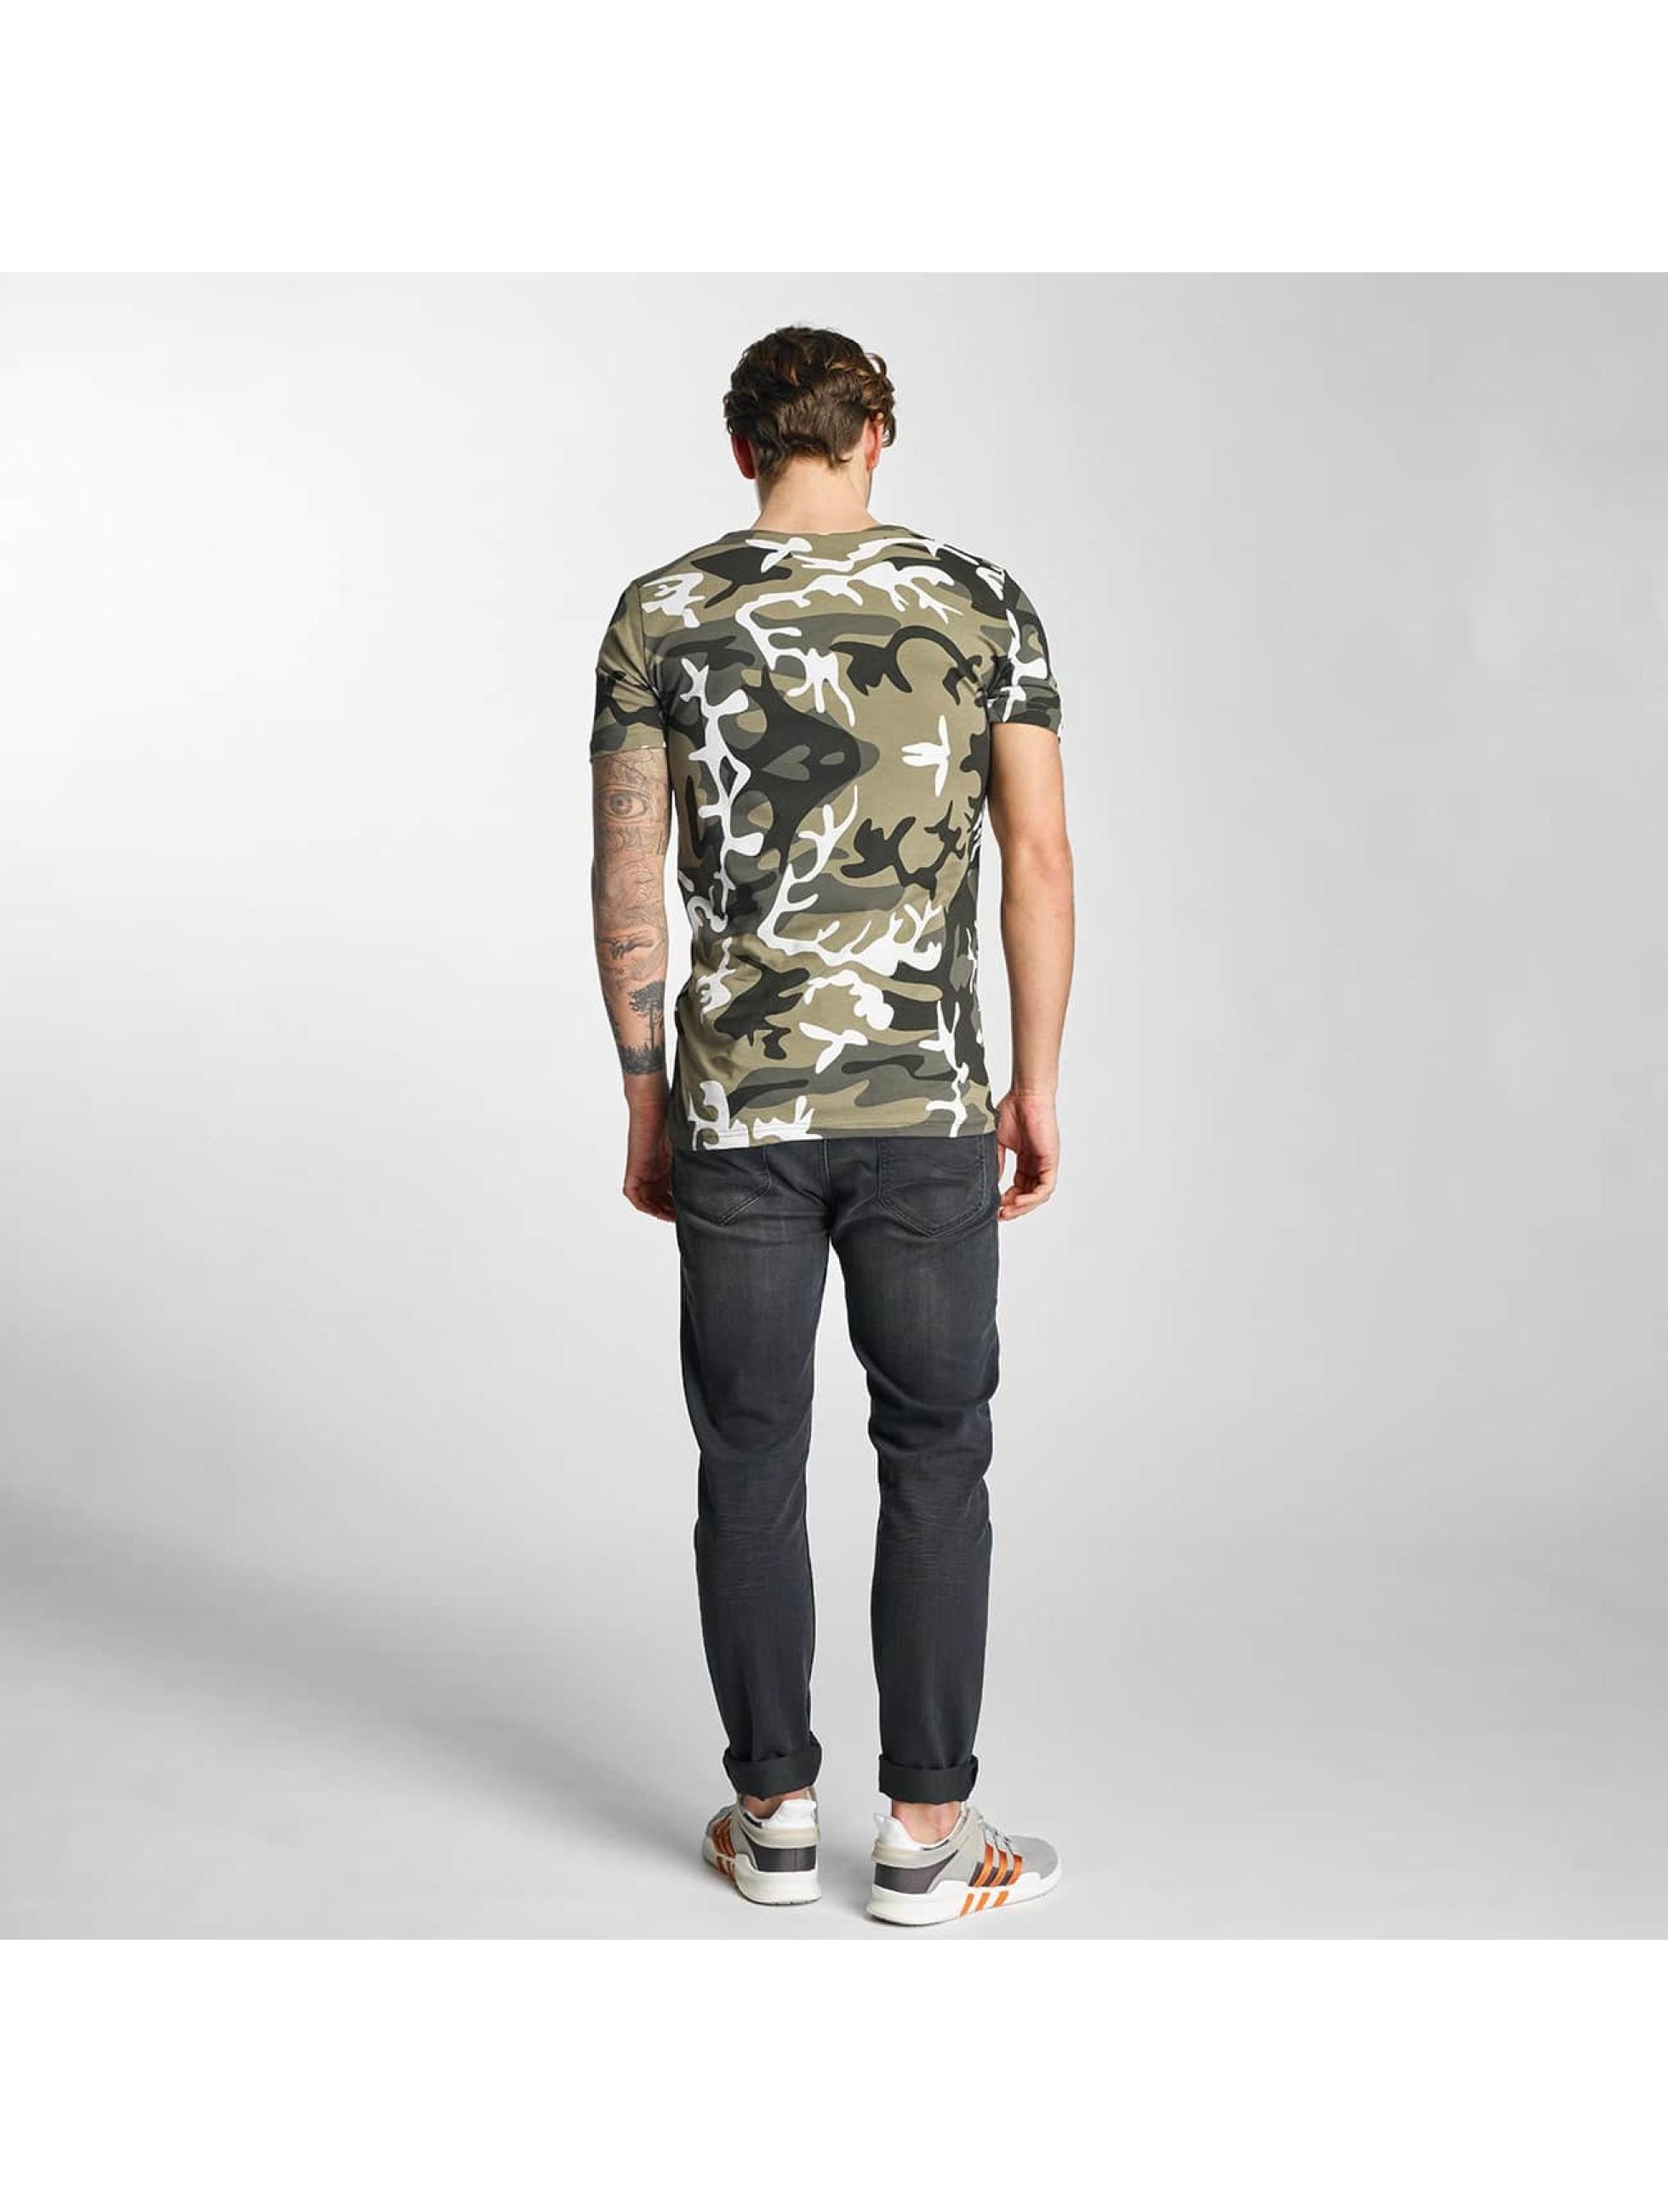 2Y T-Shirt Camo khaki